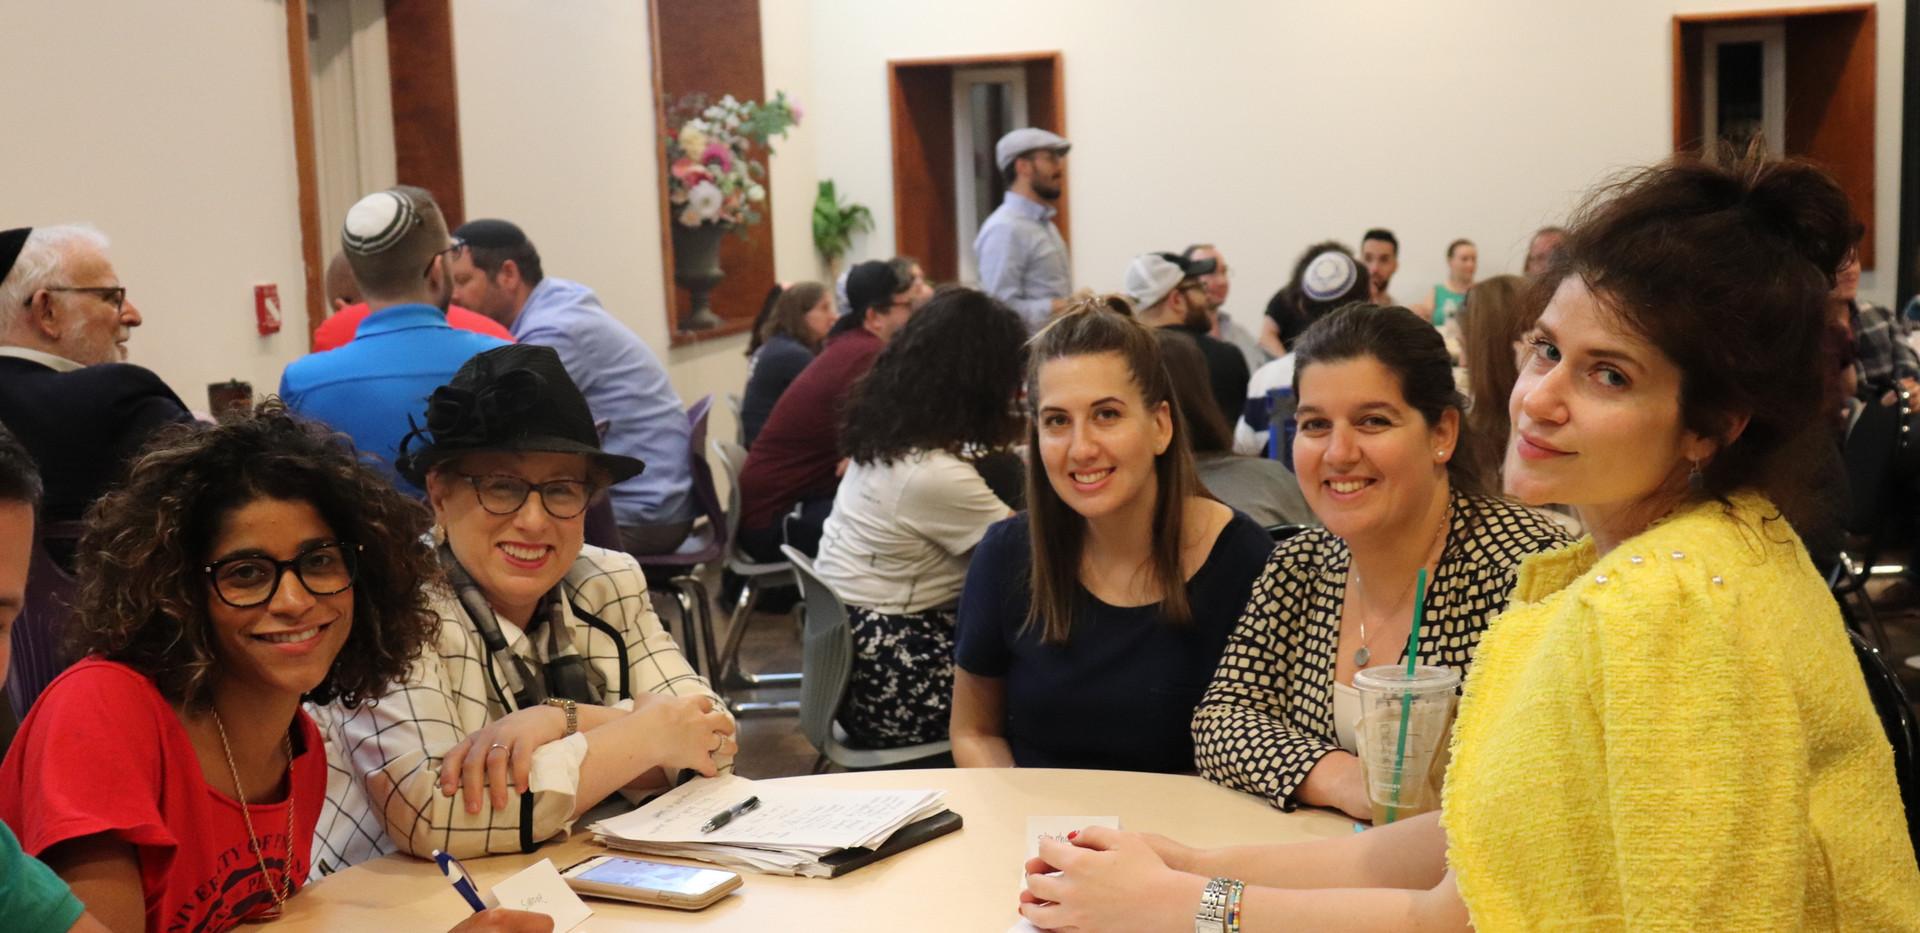 adena_s women_s study group.jpg